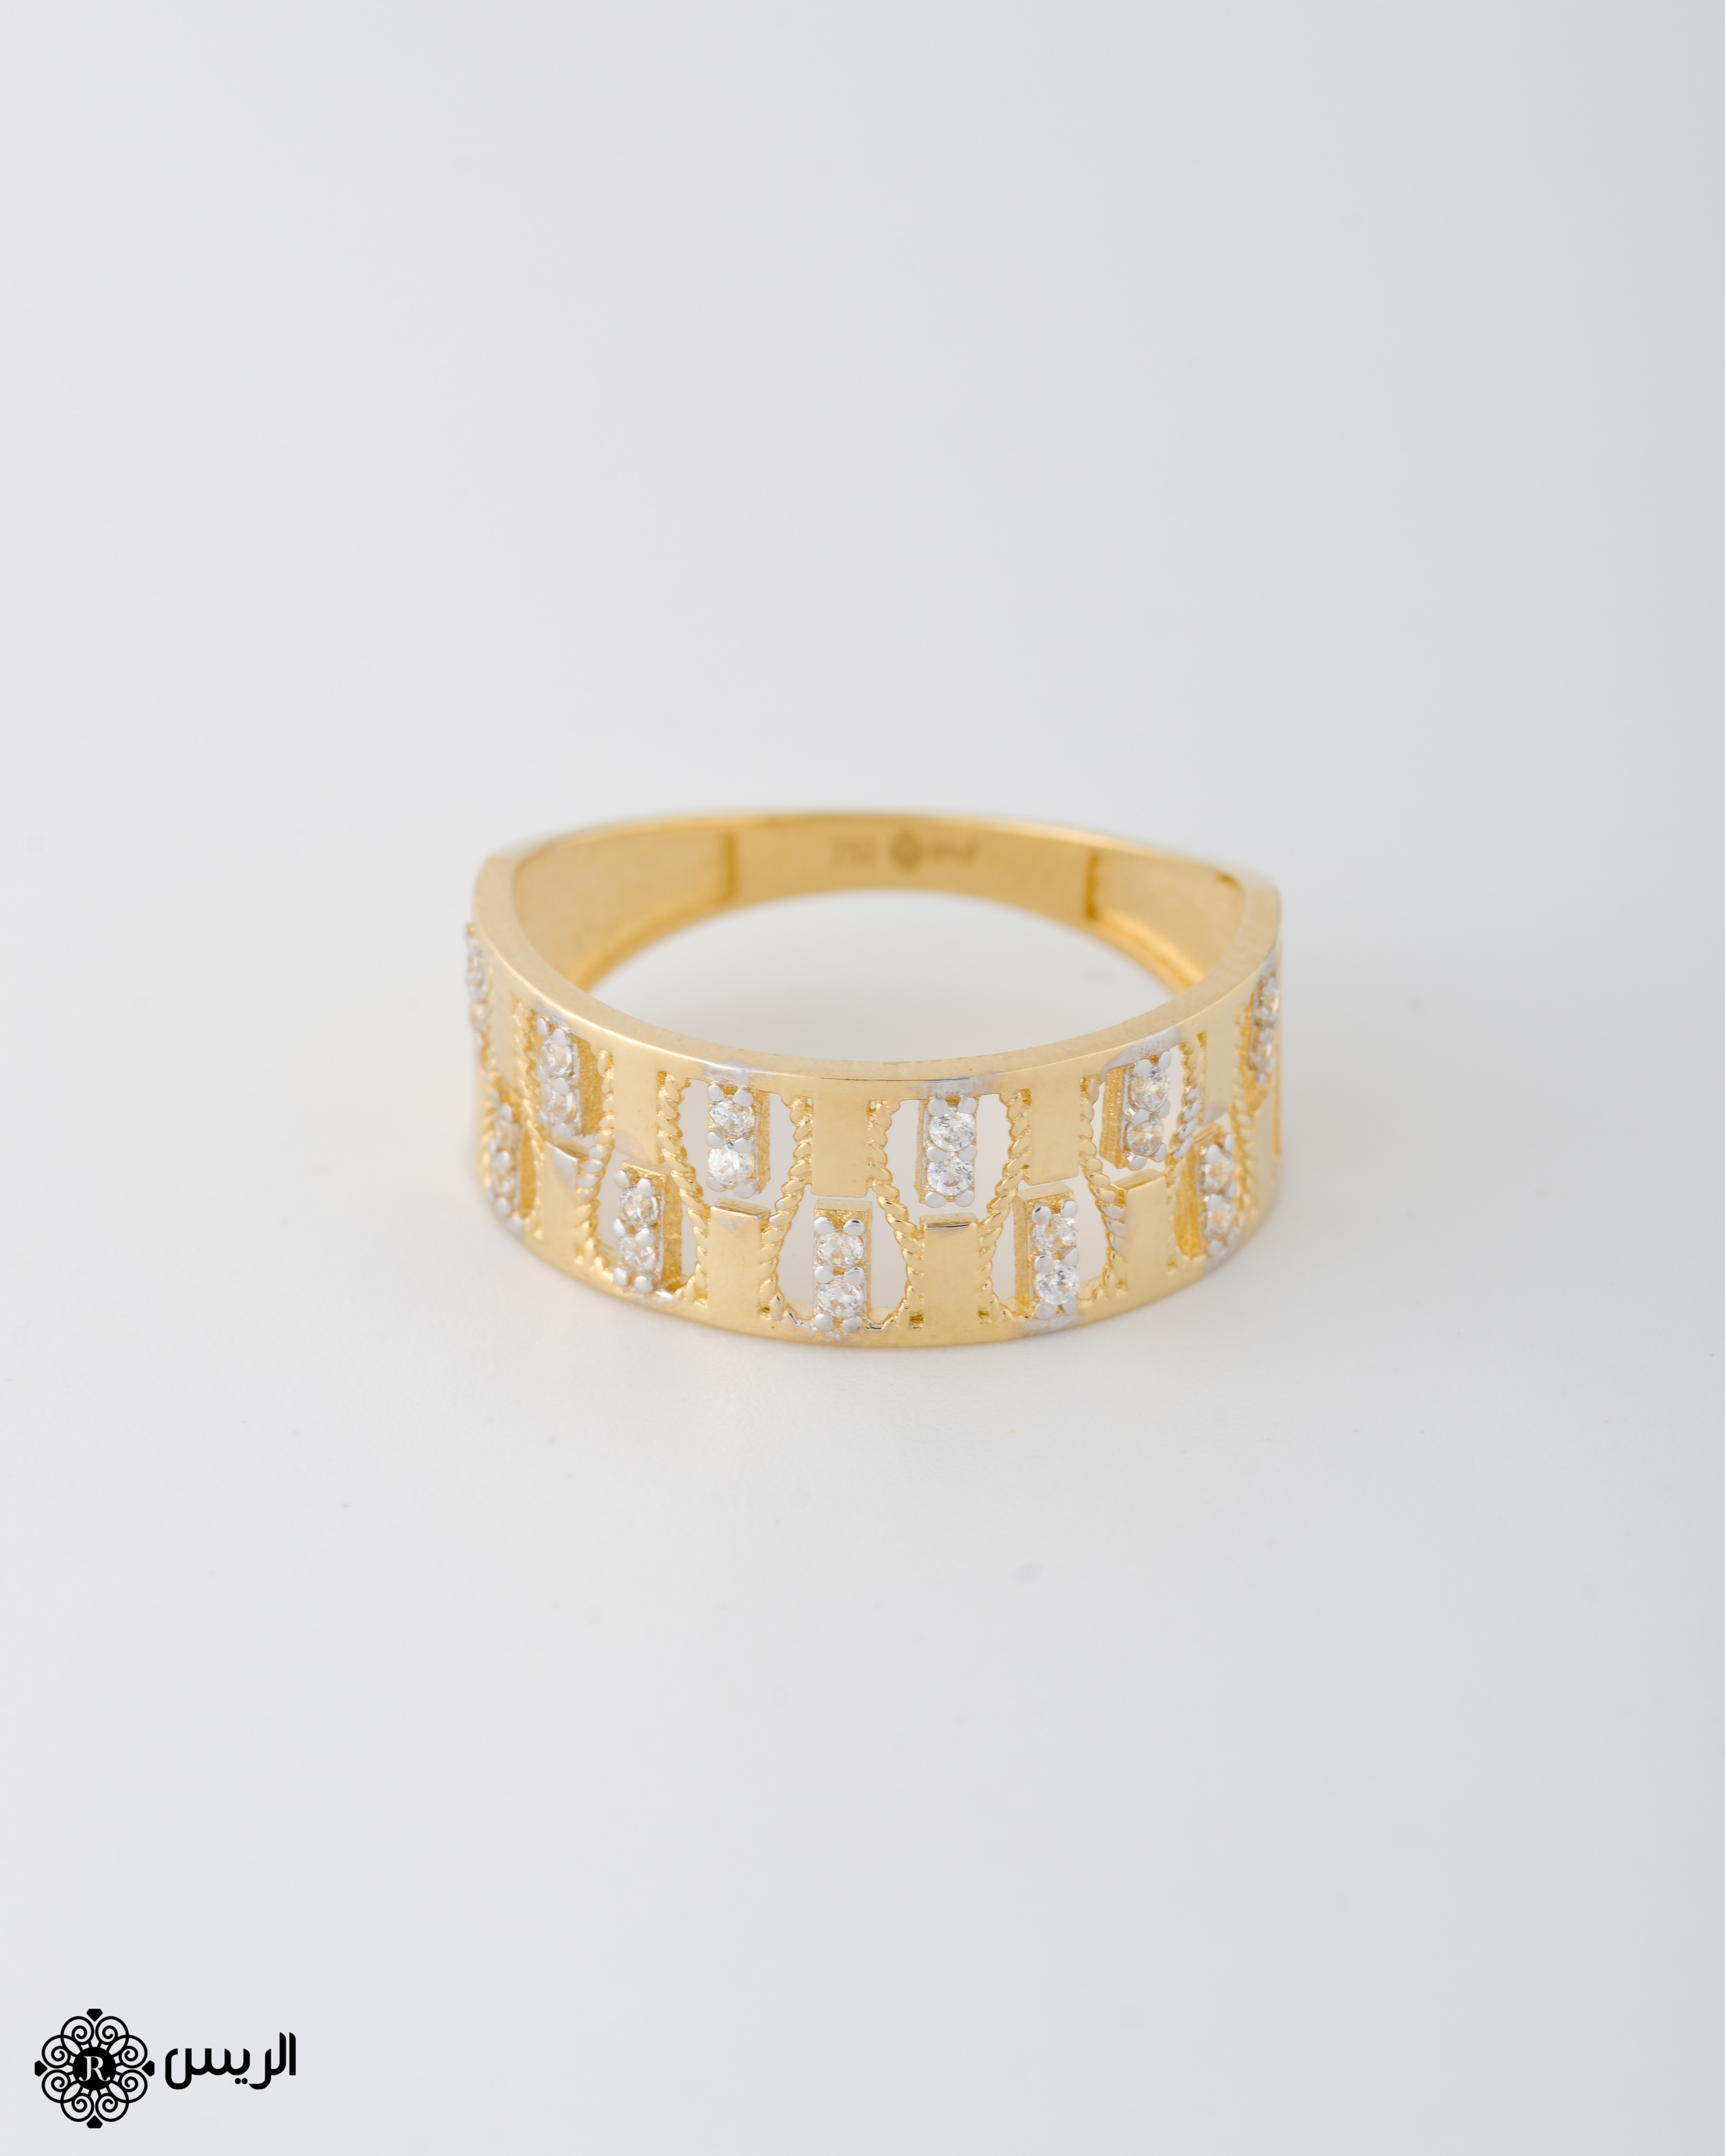 Raies jewelry Italian Design خاتم تصميم إيطالي الريس للمجوهرات